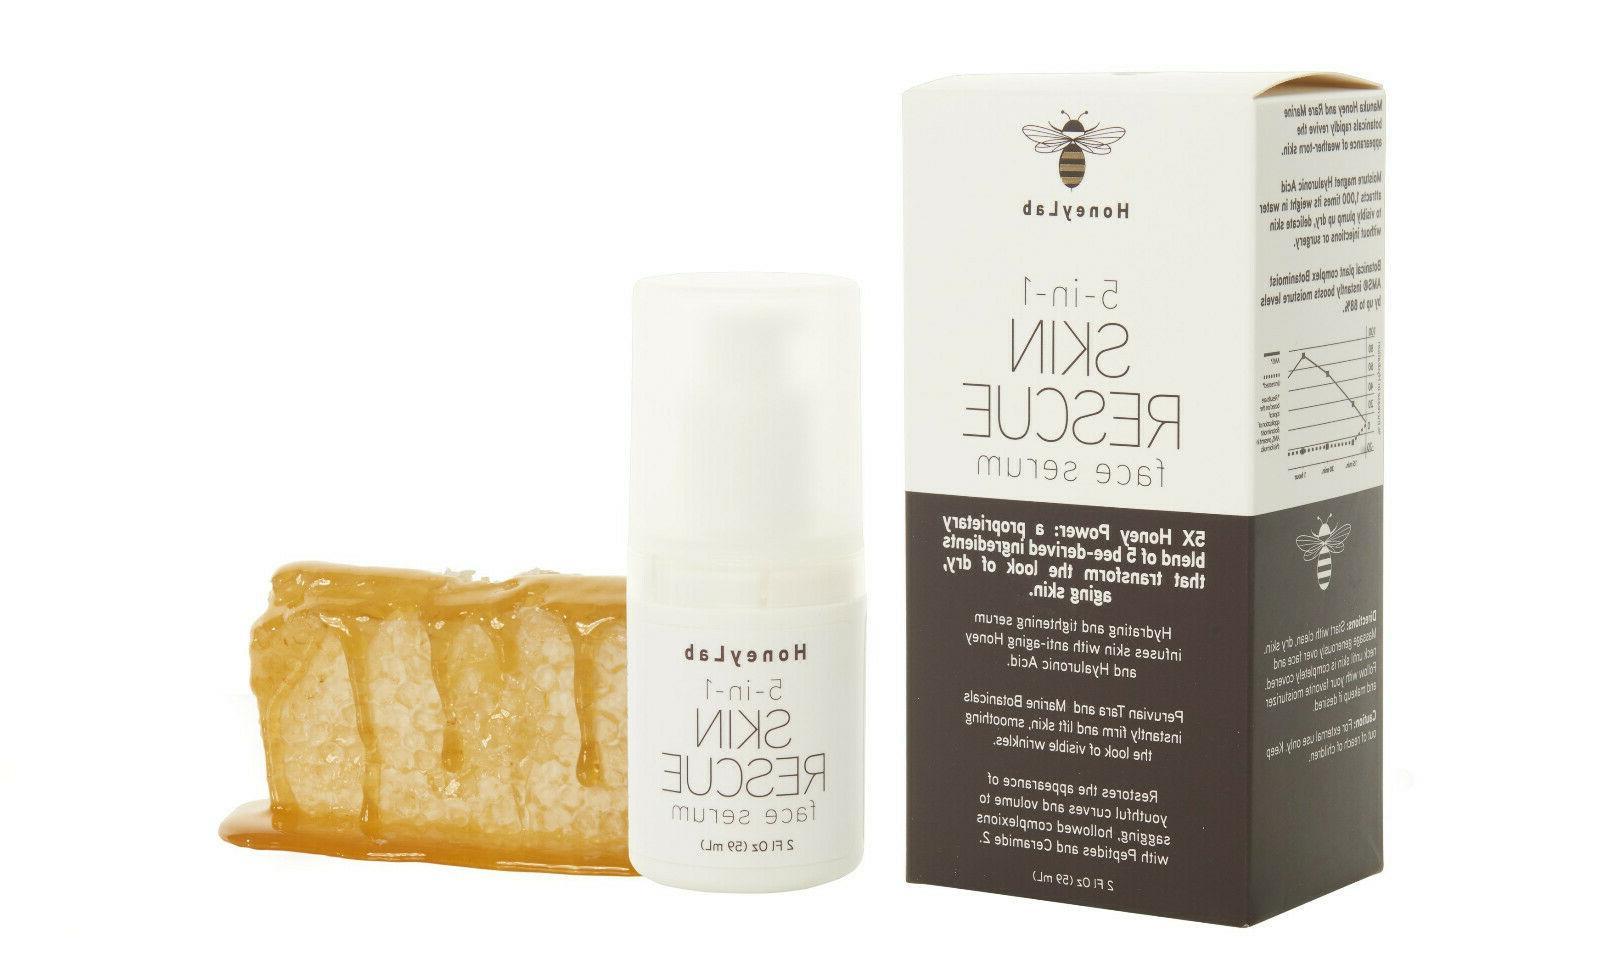 HoneyLab 5 1 Skin Face Serum 2 oz New!!